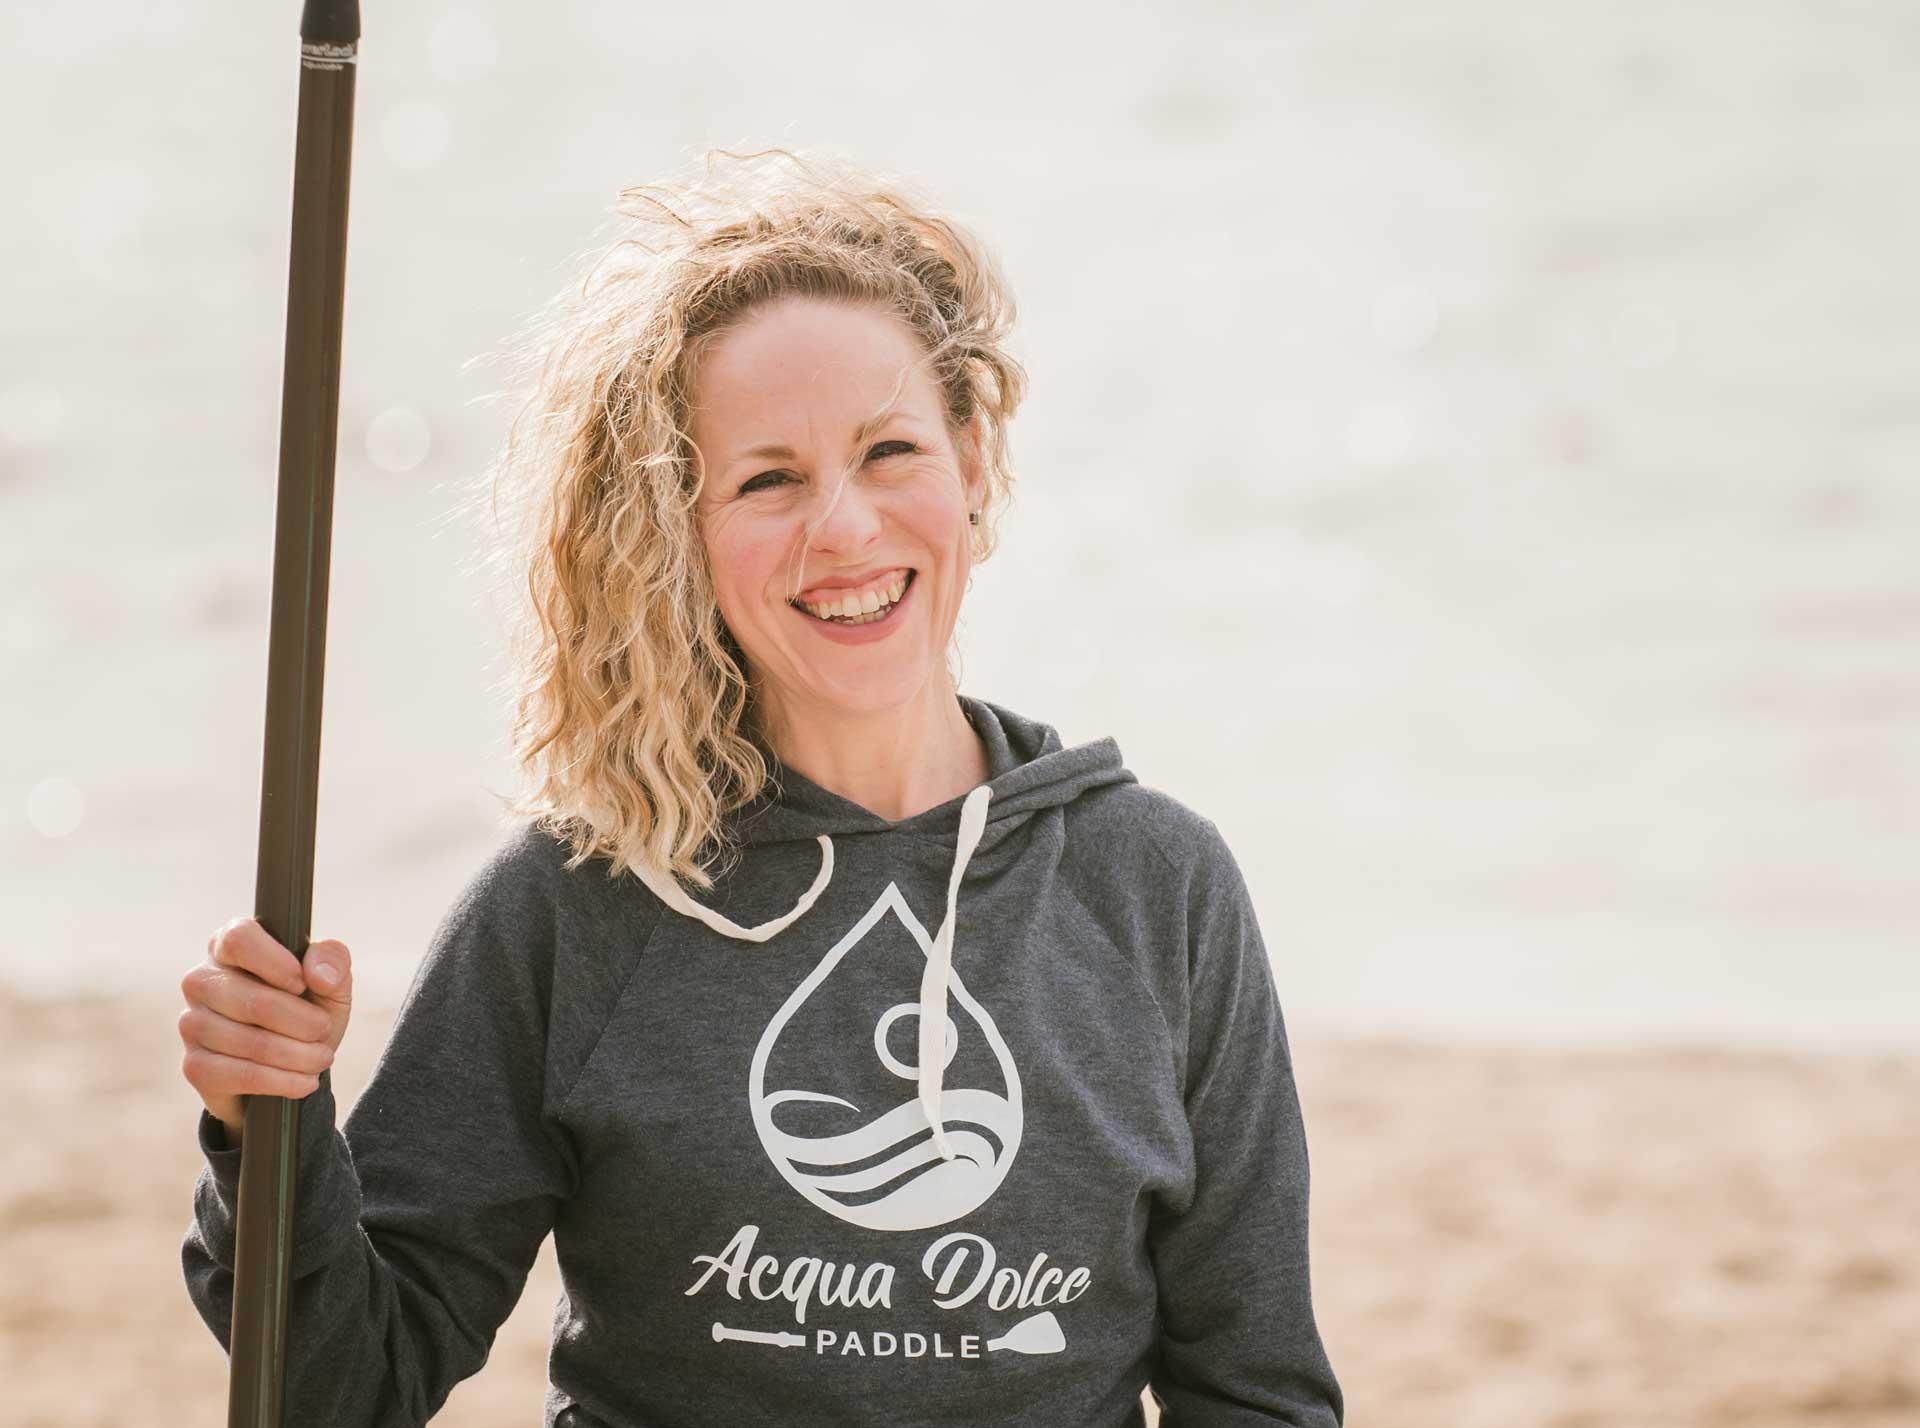 Acqua Dolce Paddle Holli Harvey Founder